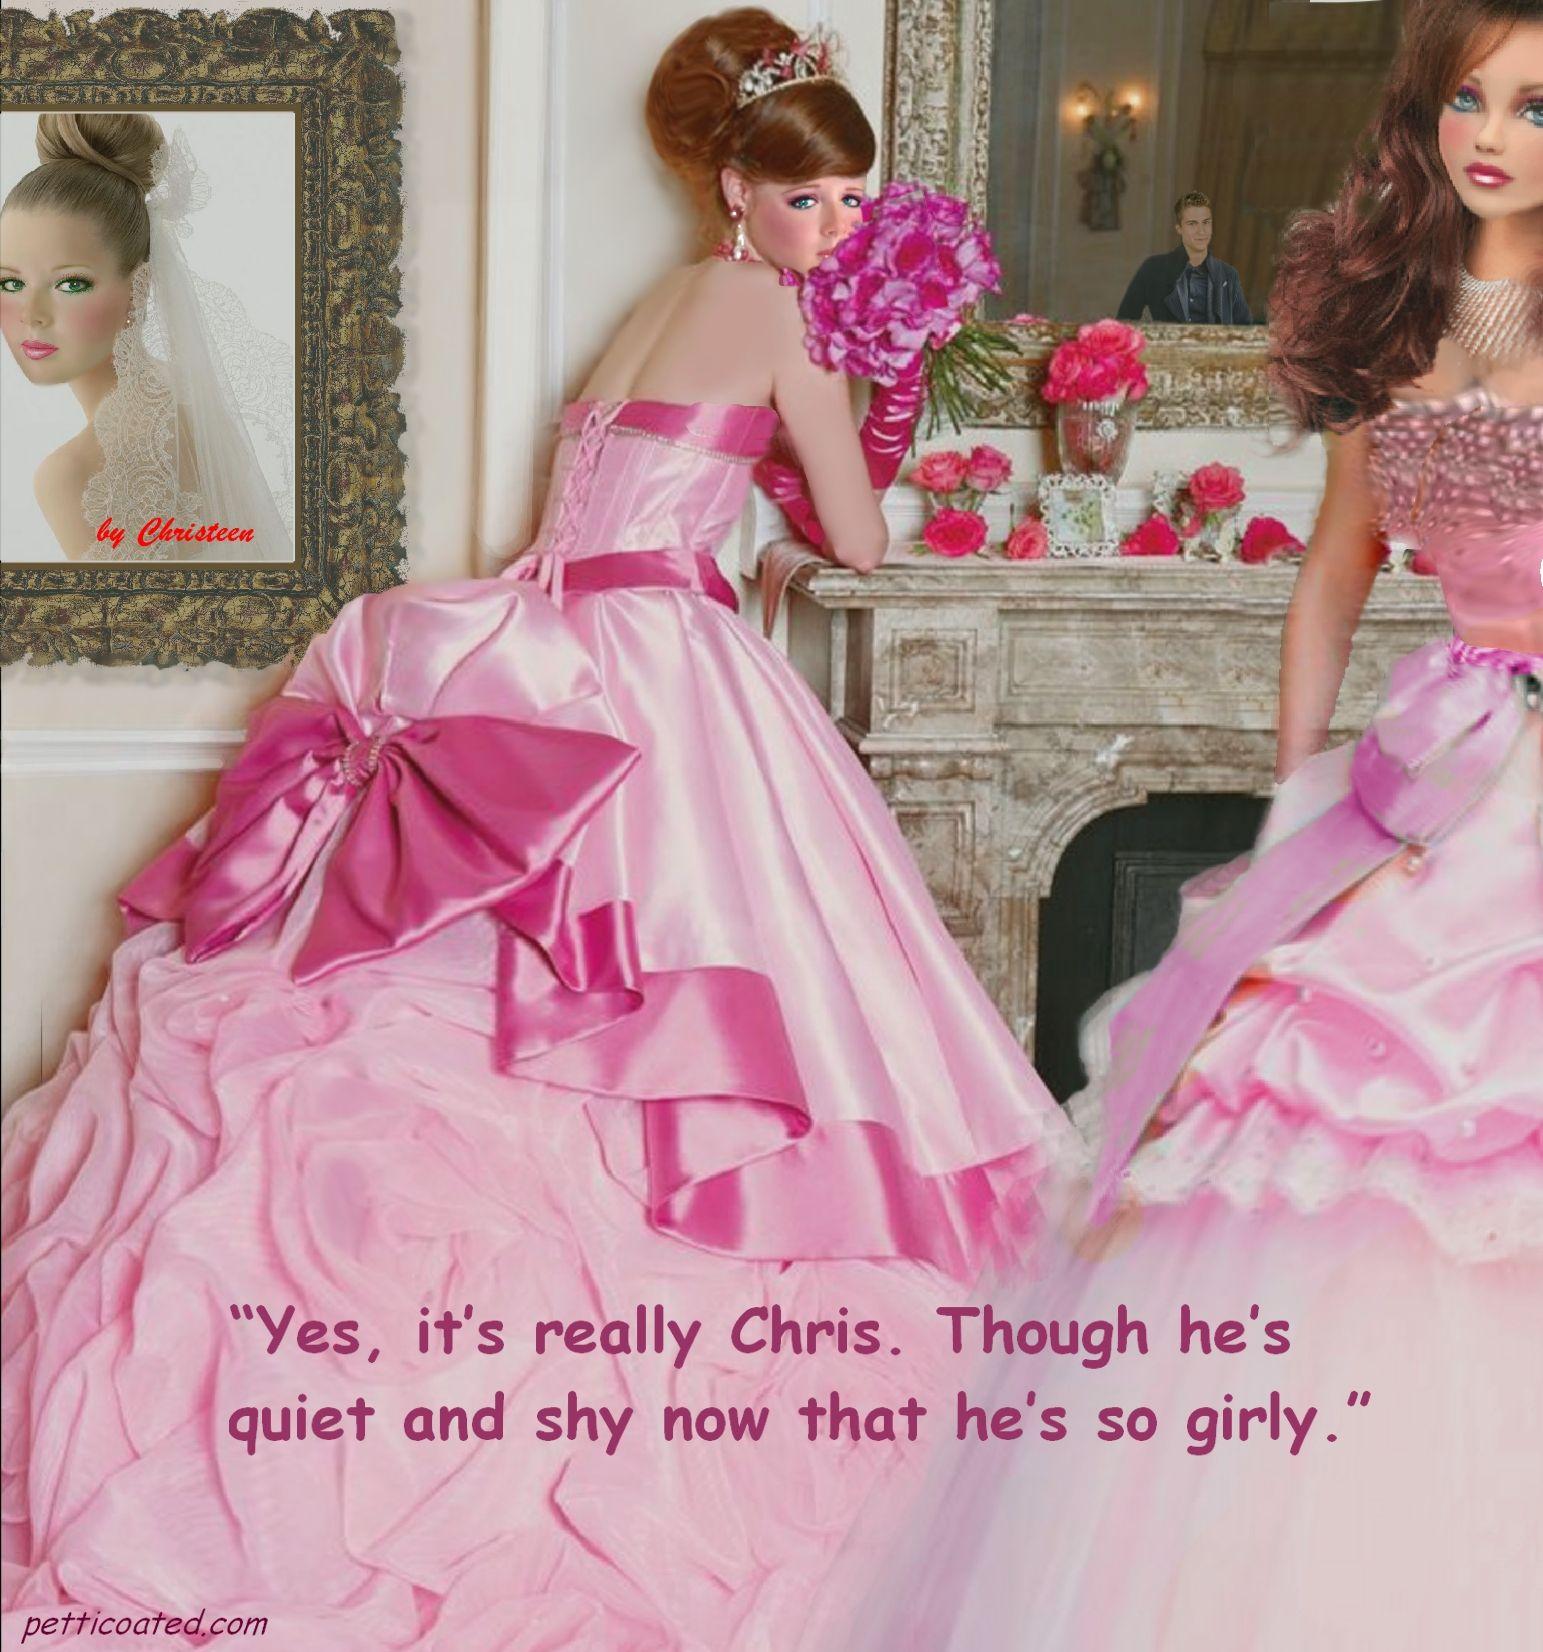 This dress makes me feel faint | Christeen | Pinterest